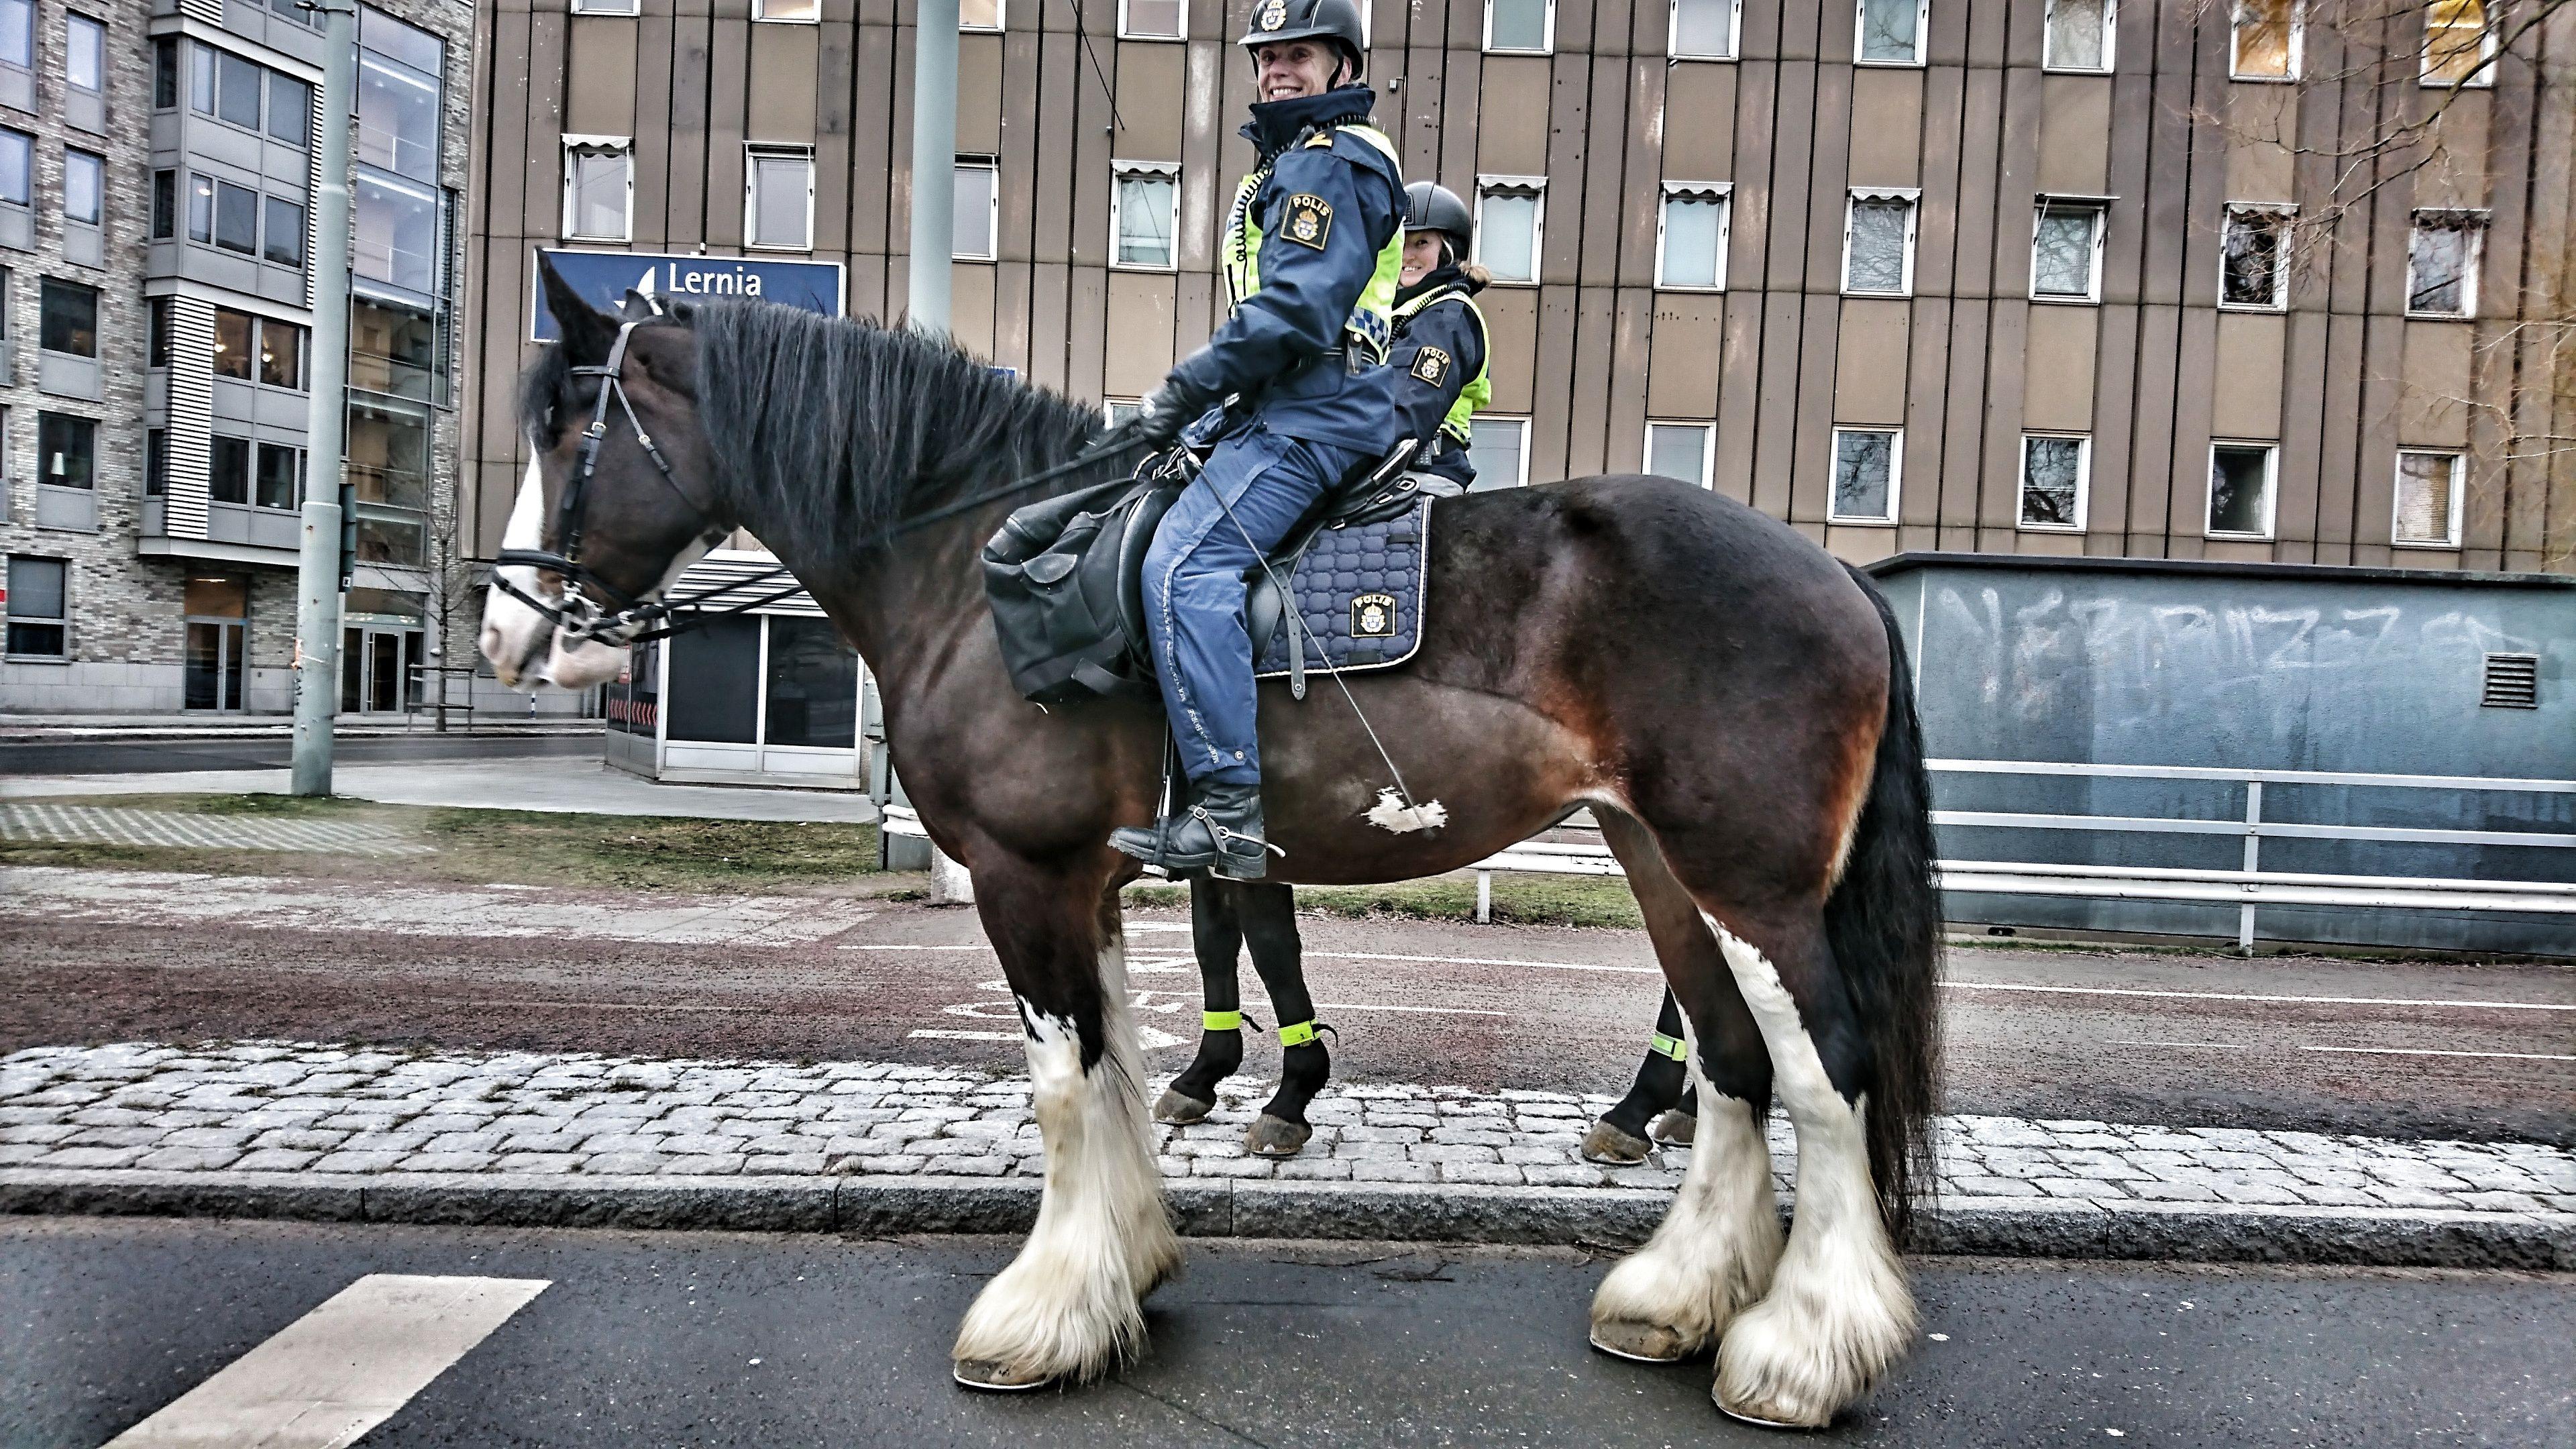 Amazing Swedish Police Horse Http Ift Tt 2k1d7dw Swedish Police Horses Police